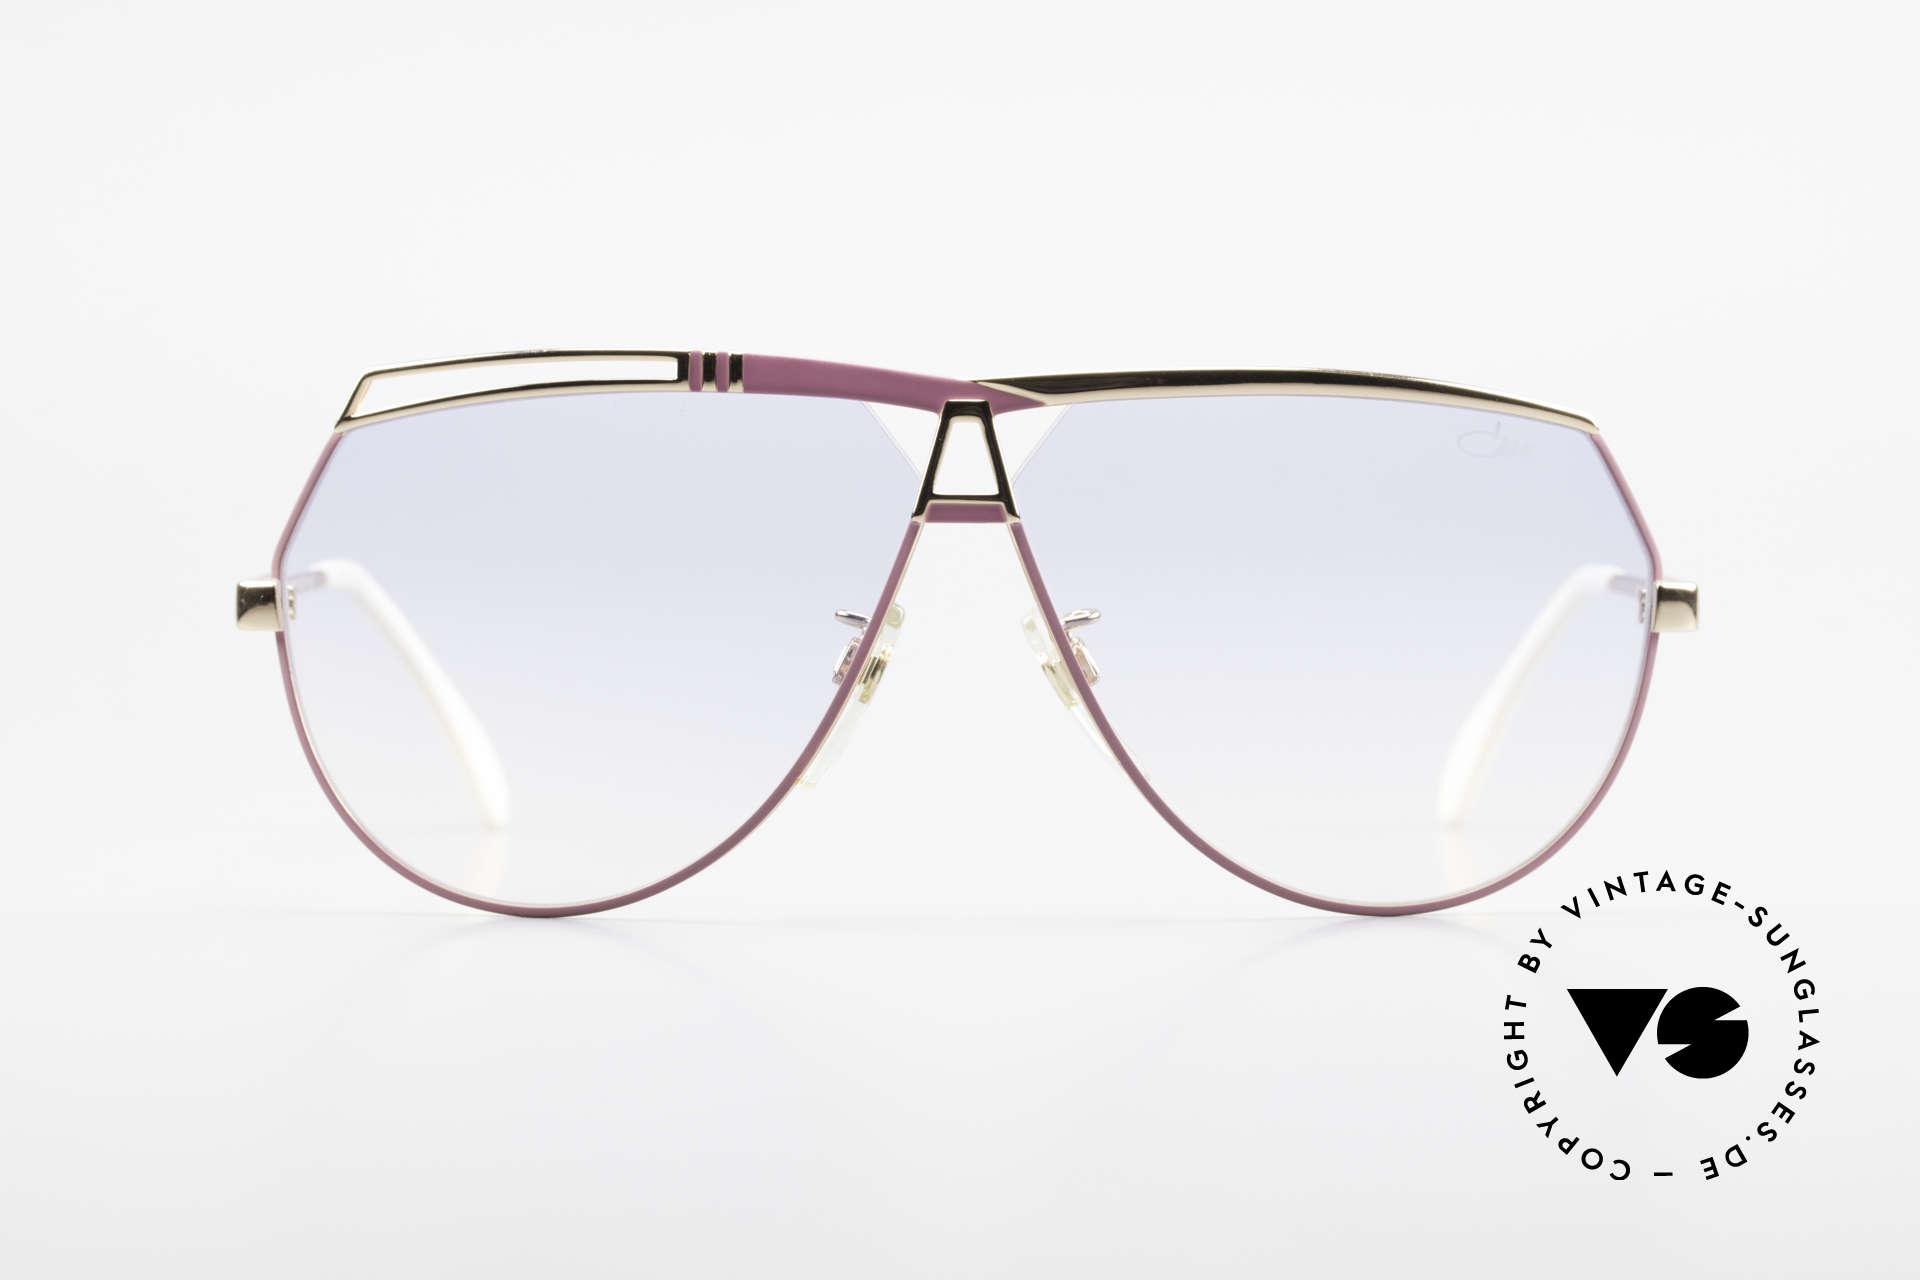 Cazal 954 Oversized 80's Sunglasses, handmade from 1989 - 1992 in Passau, Bavaria, Made for Women